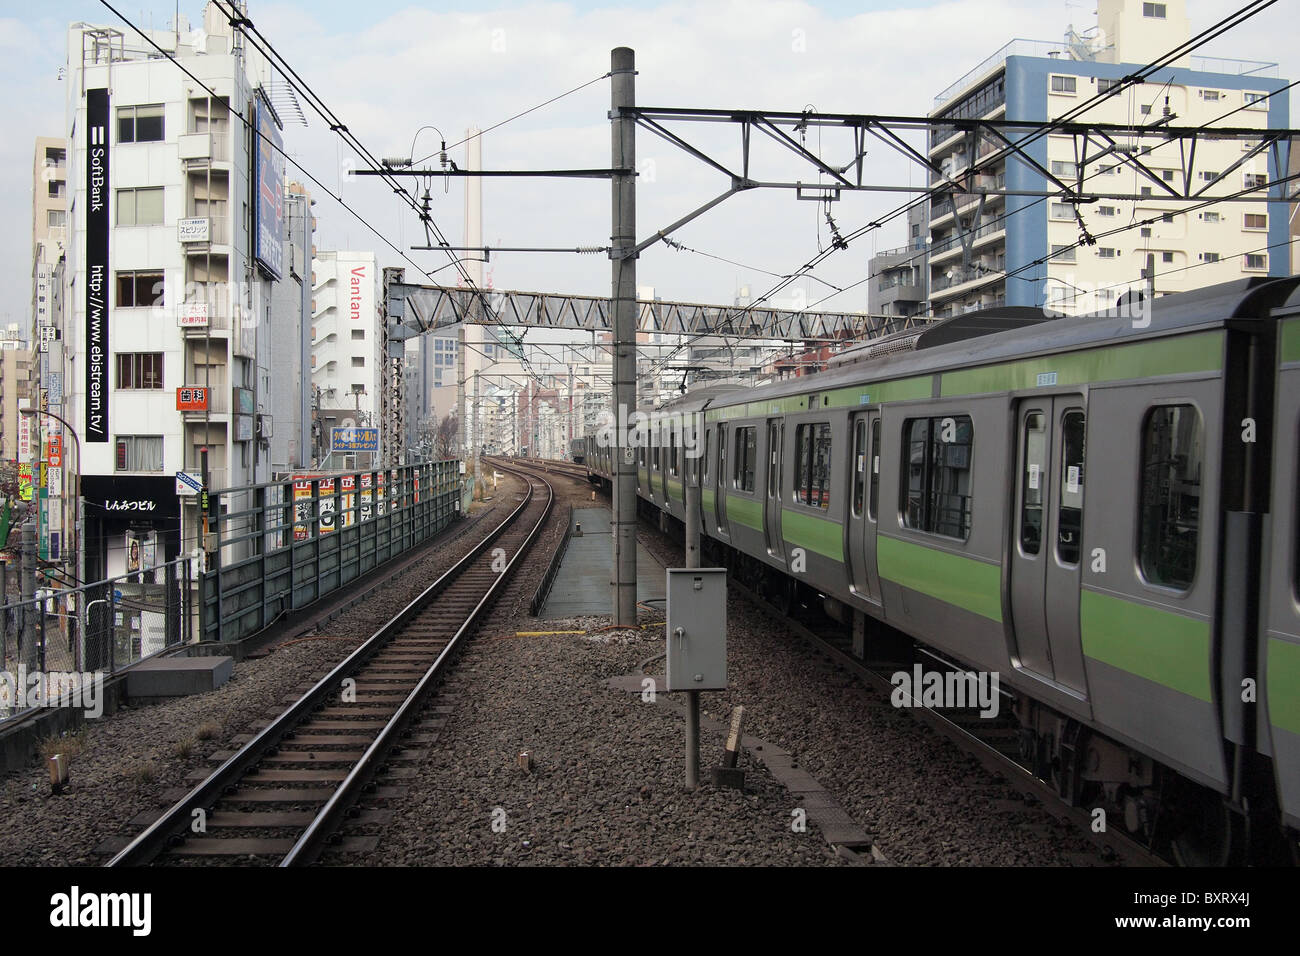 Overground train in Tokyo Japan - Stock Image